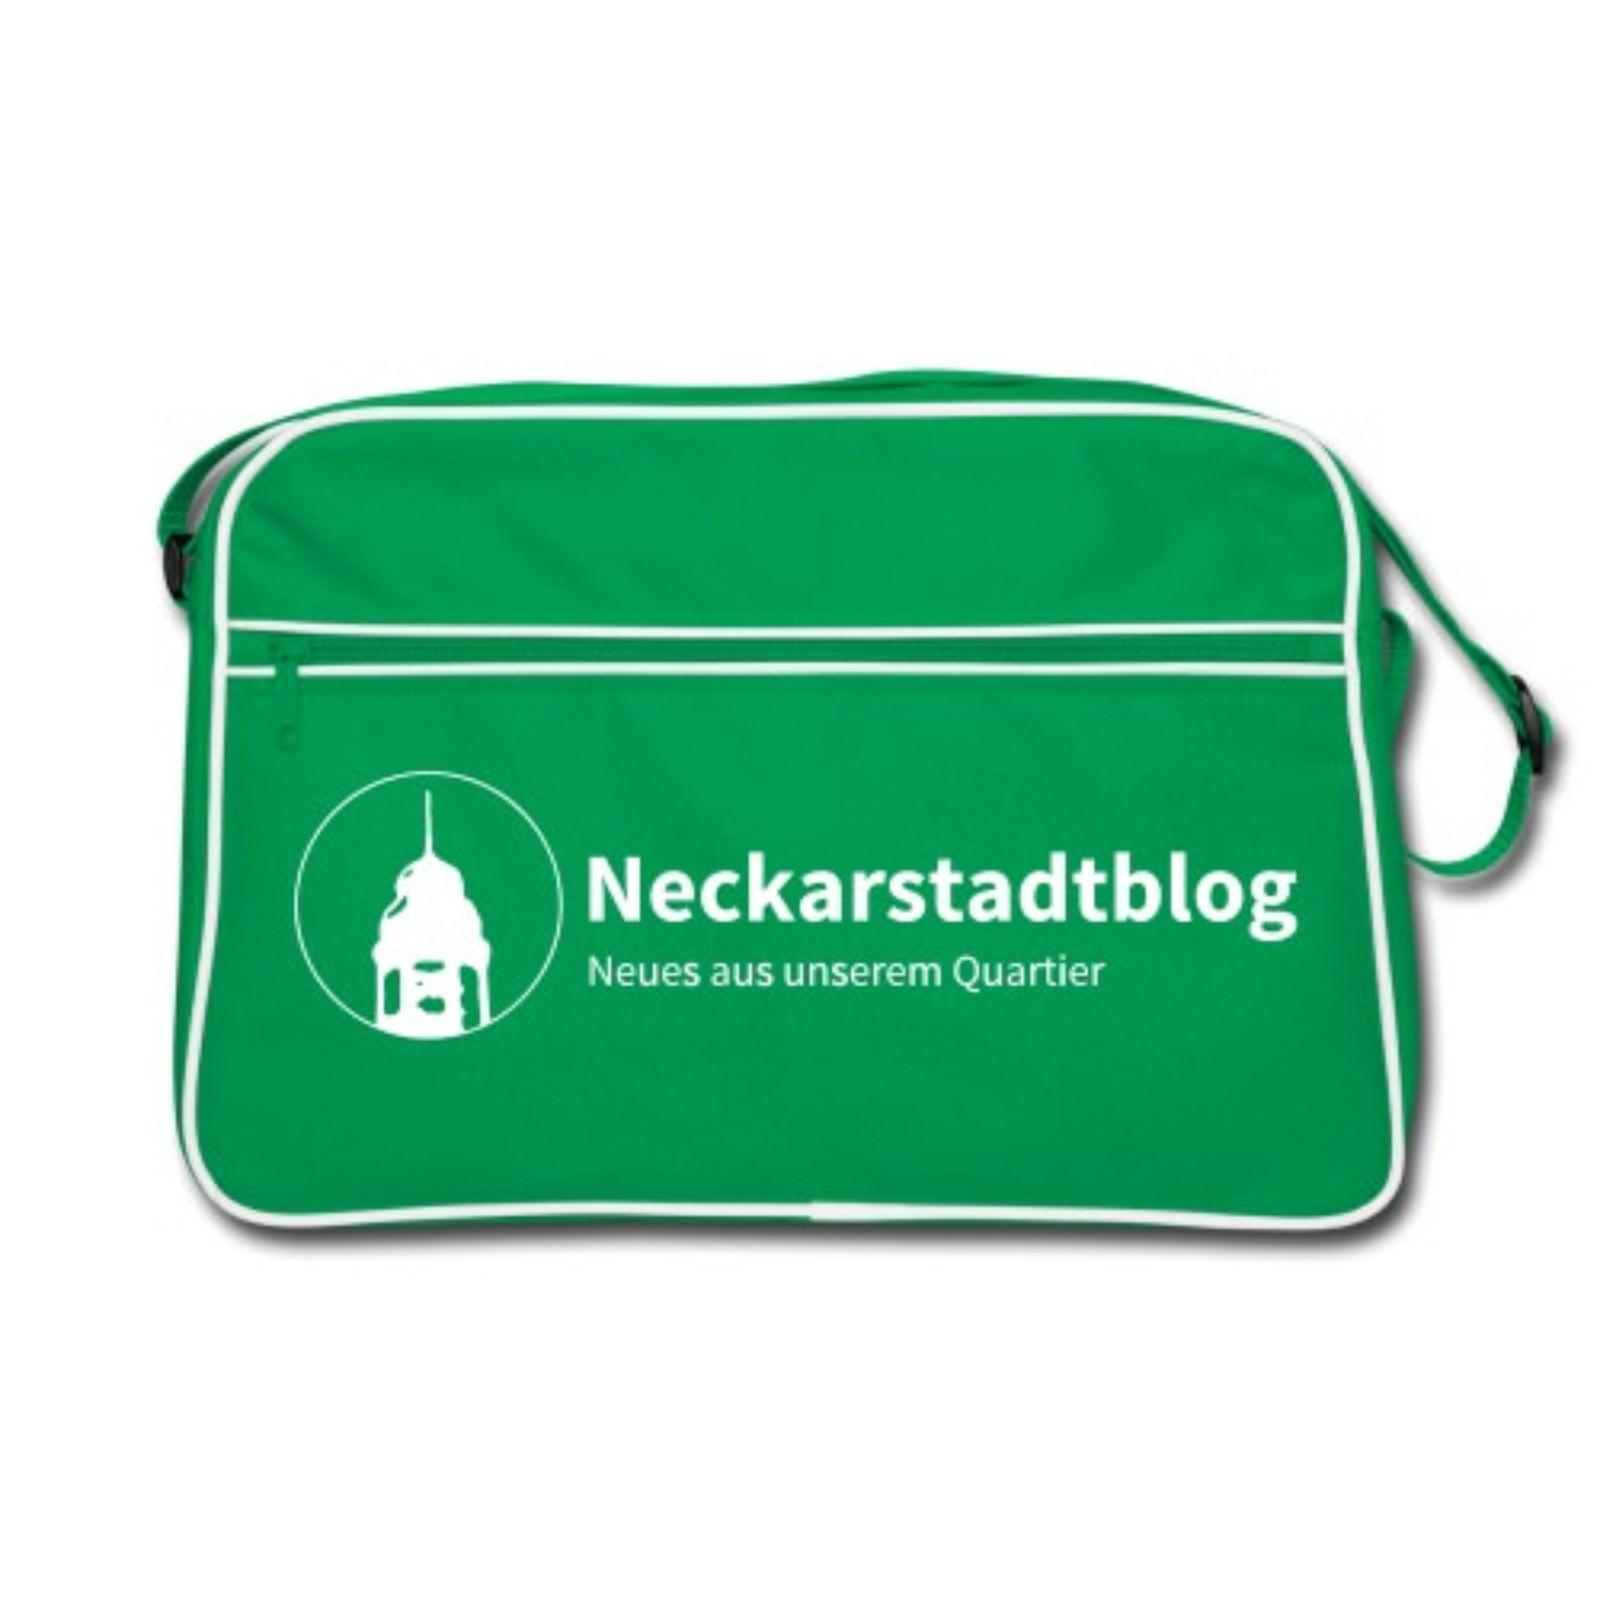 neckarstadtblog-logo-claim-retro-tasche